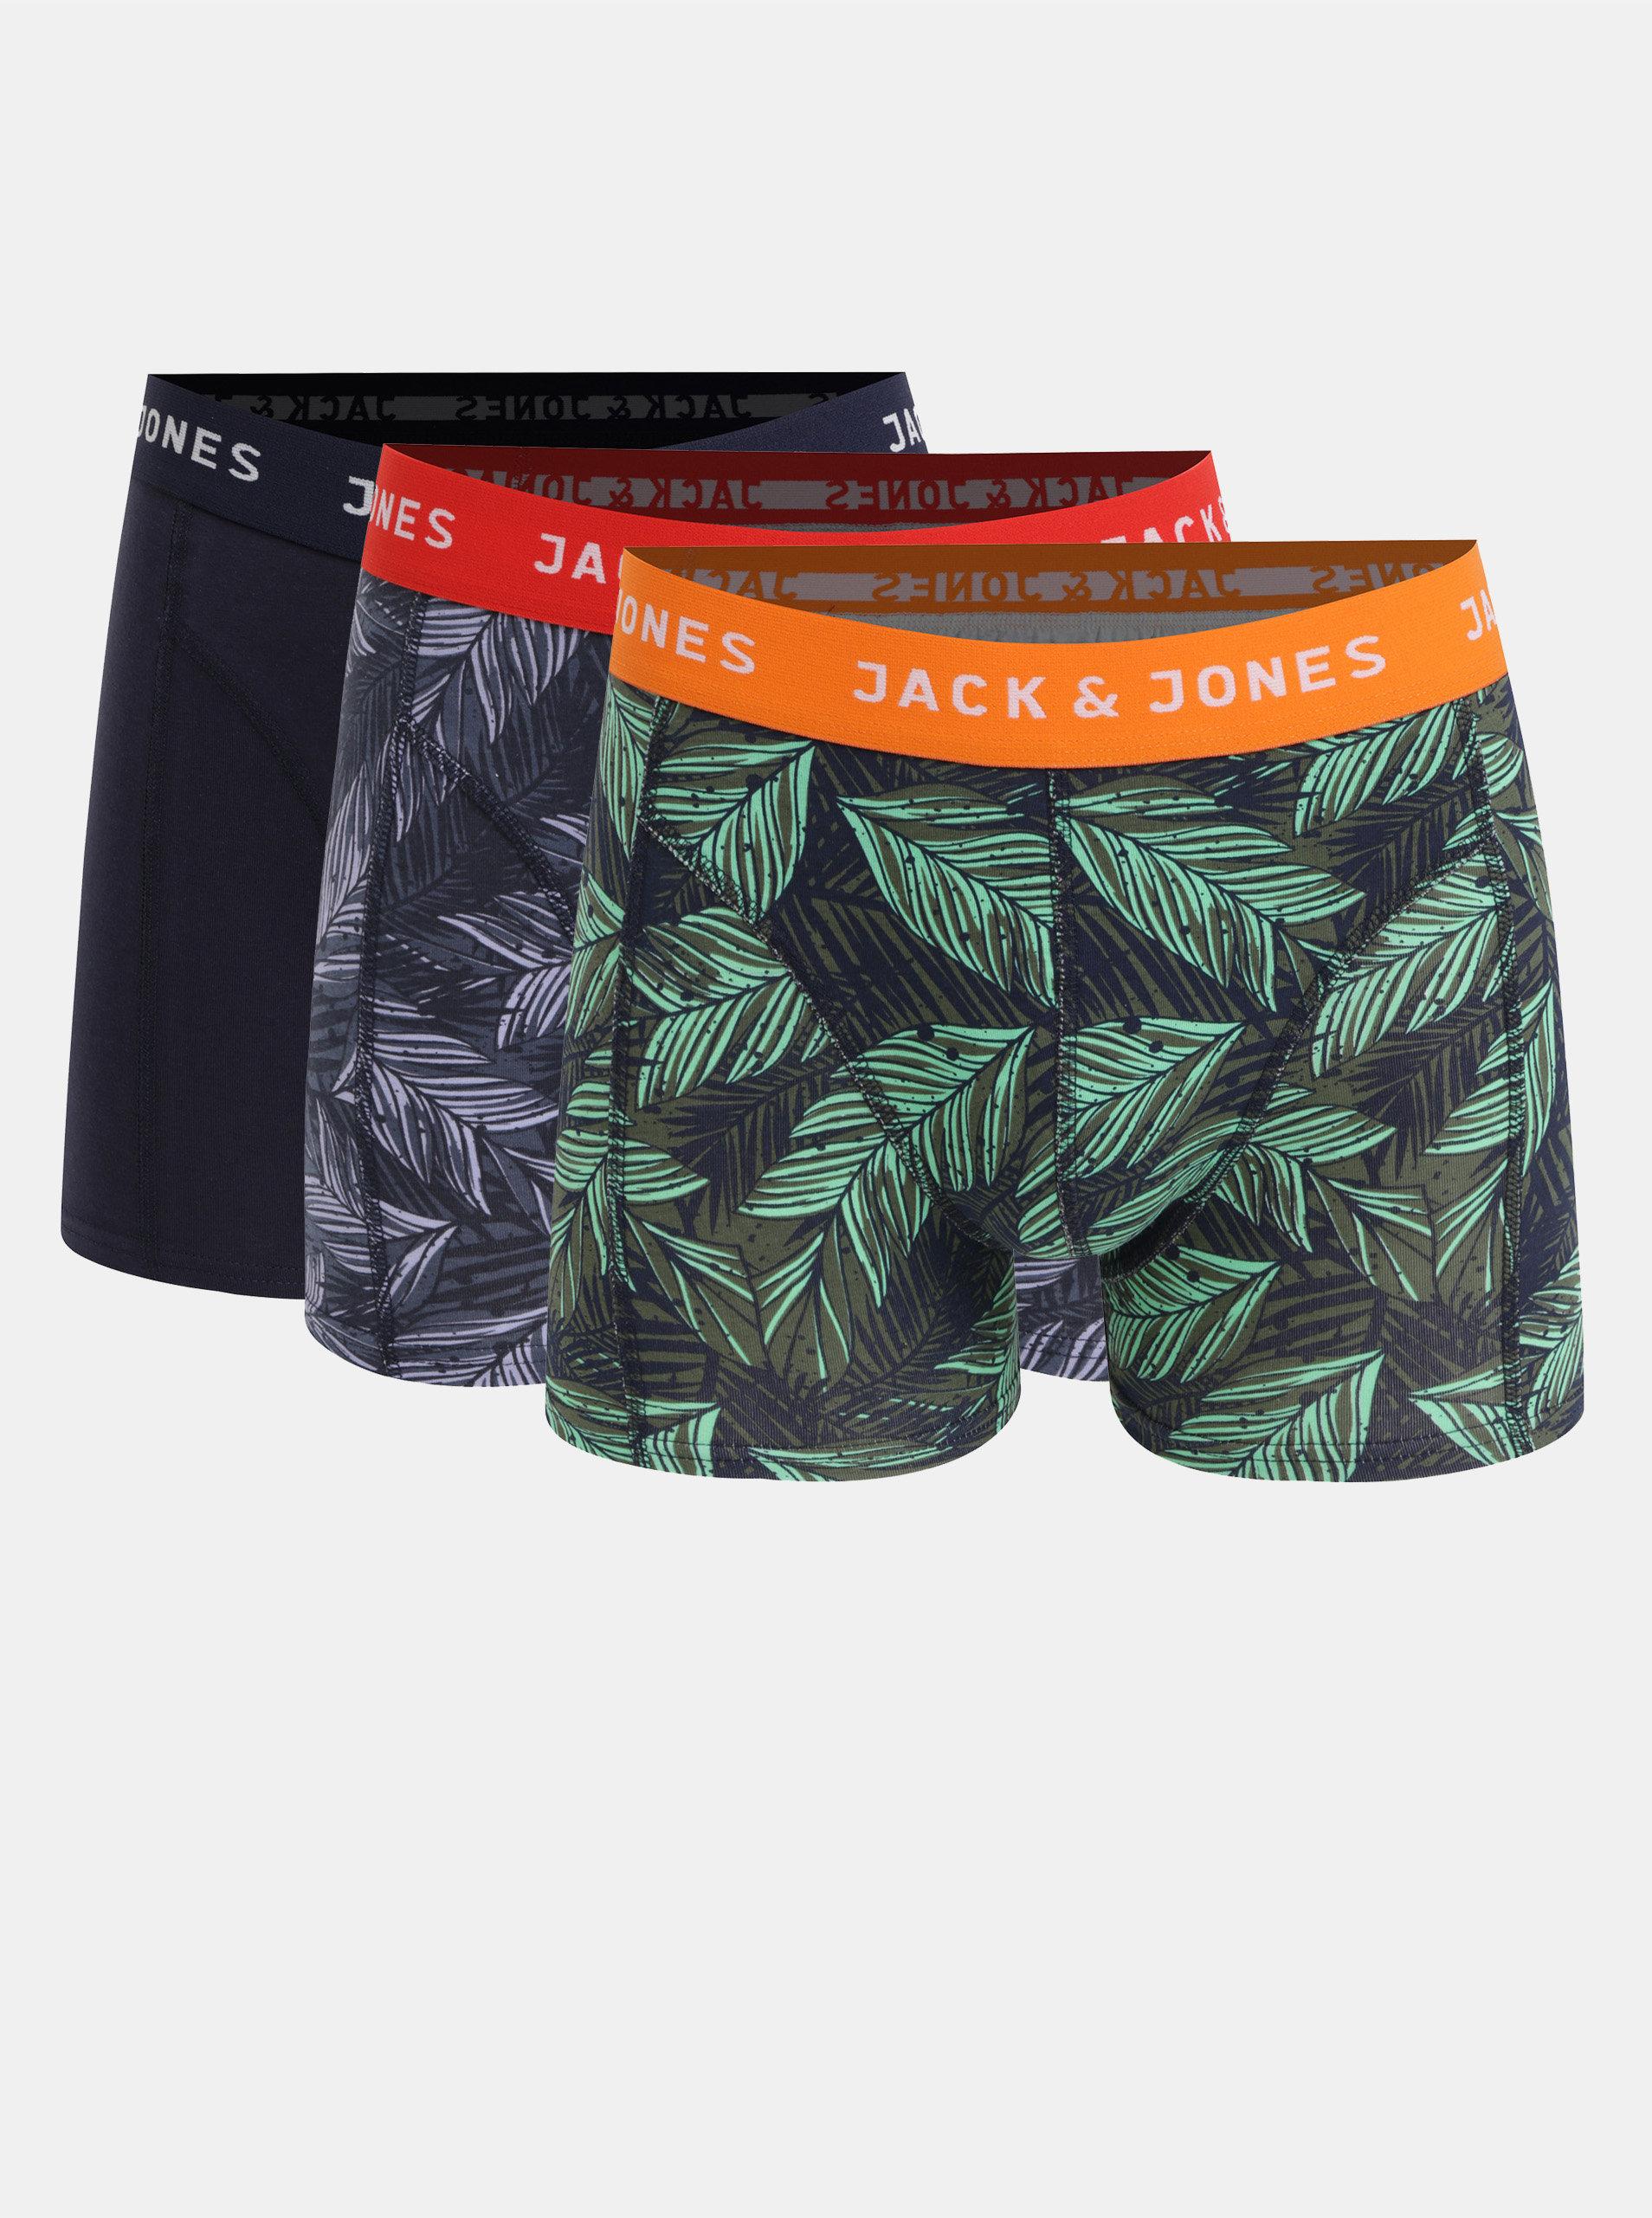 Sada tří vzorovaných boxerek v modré a zelené barvě Jack & Jones Edinburgh